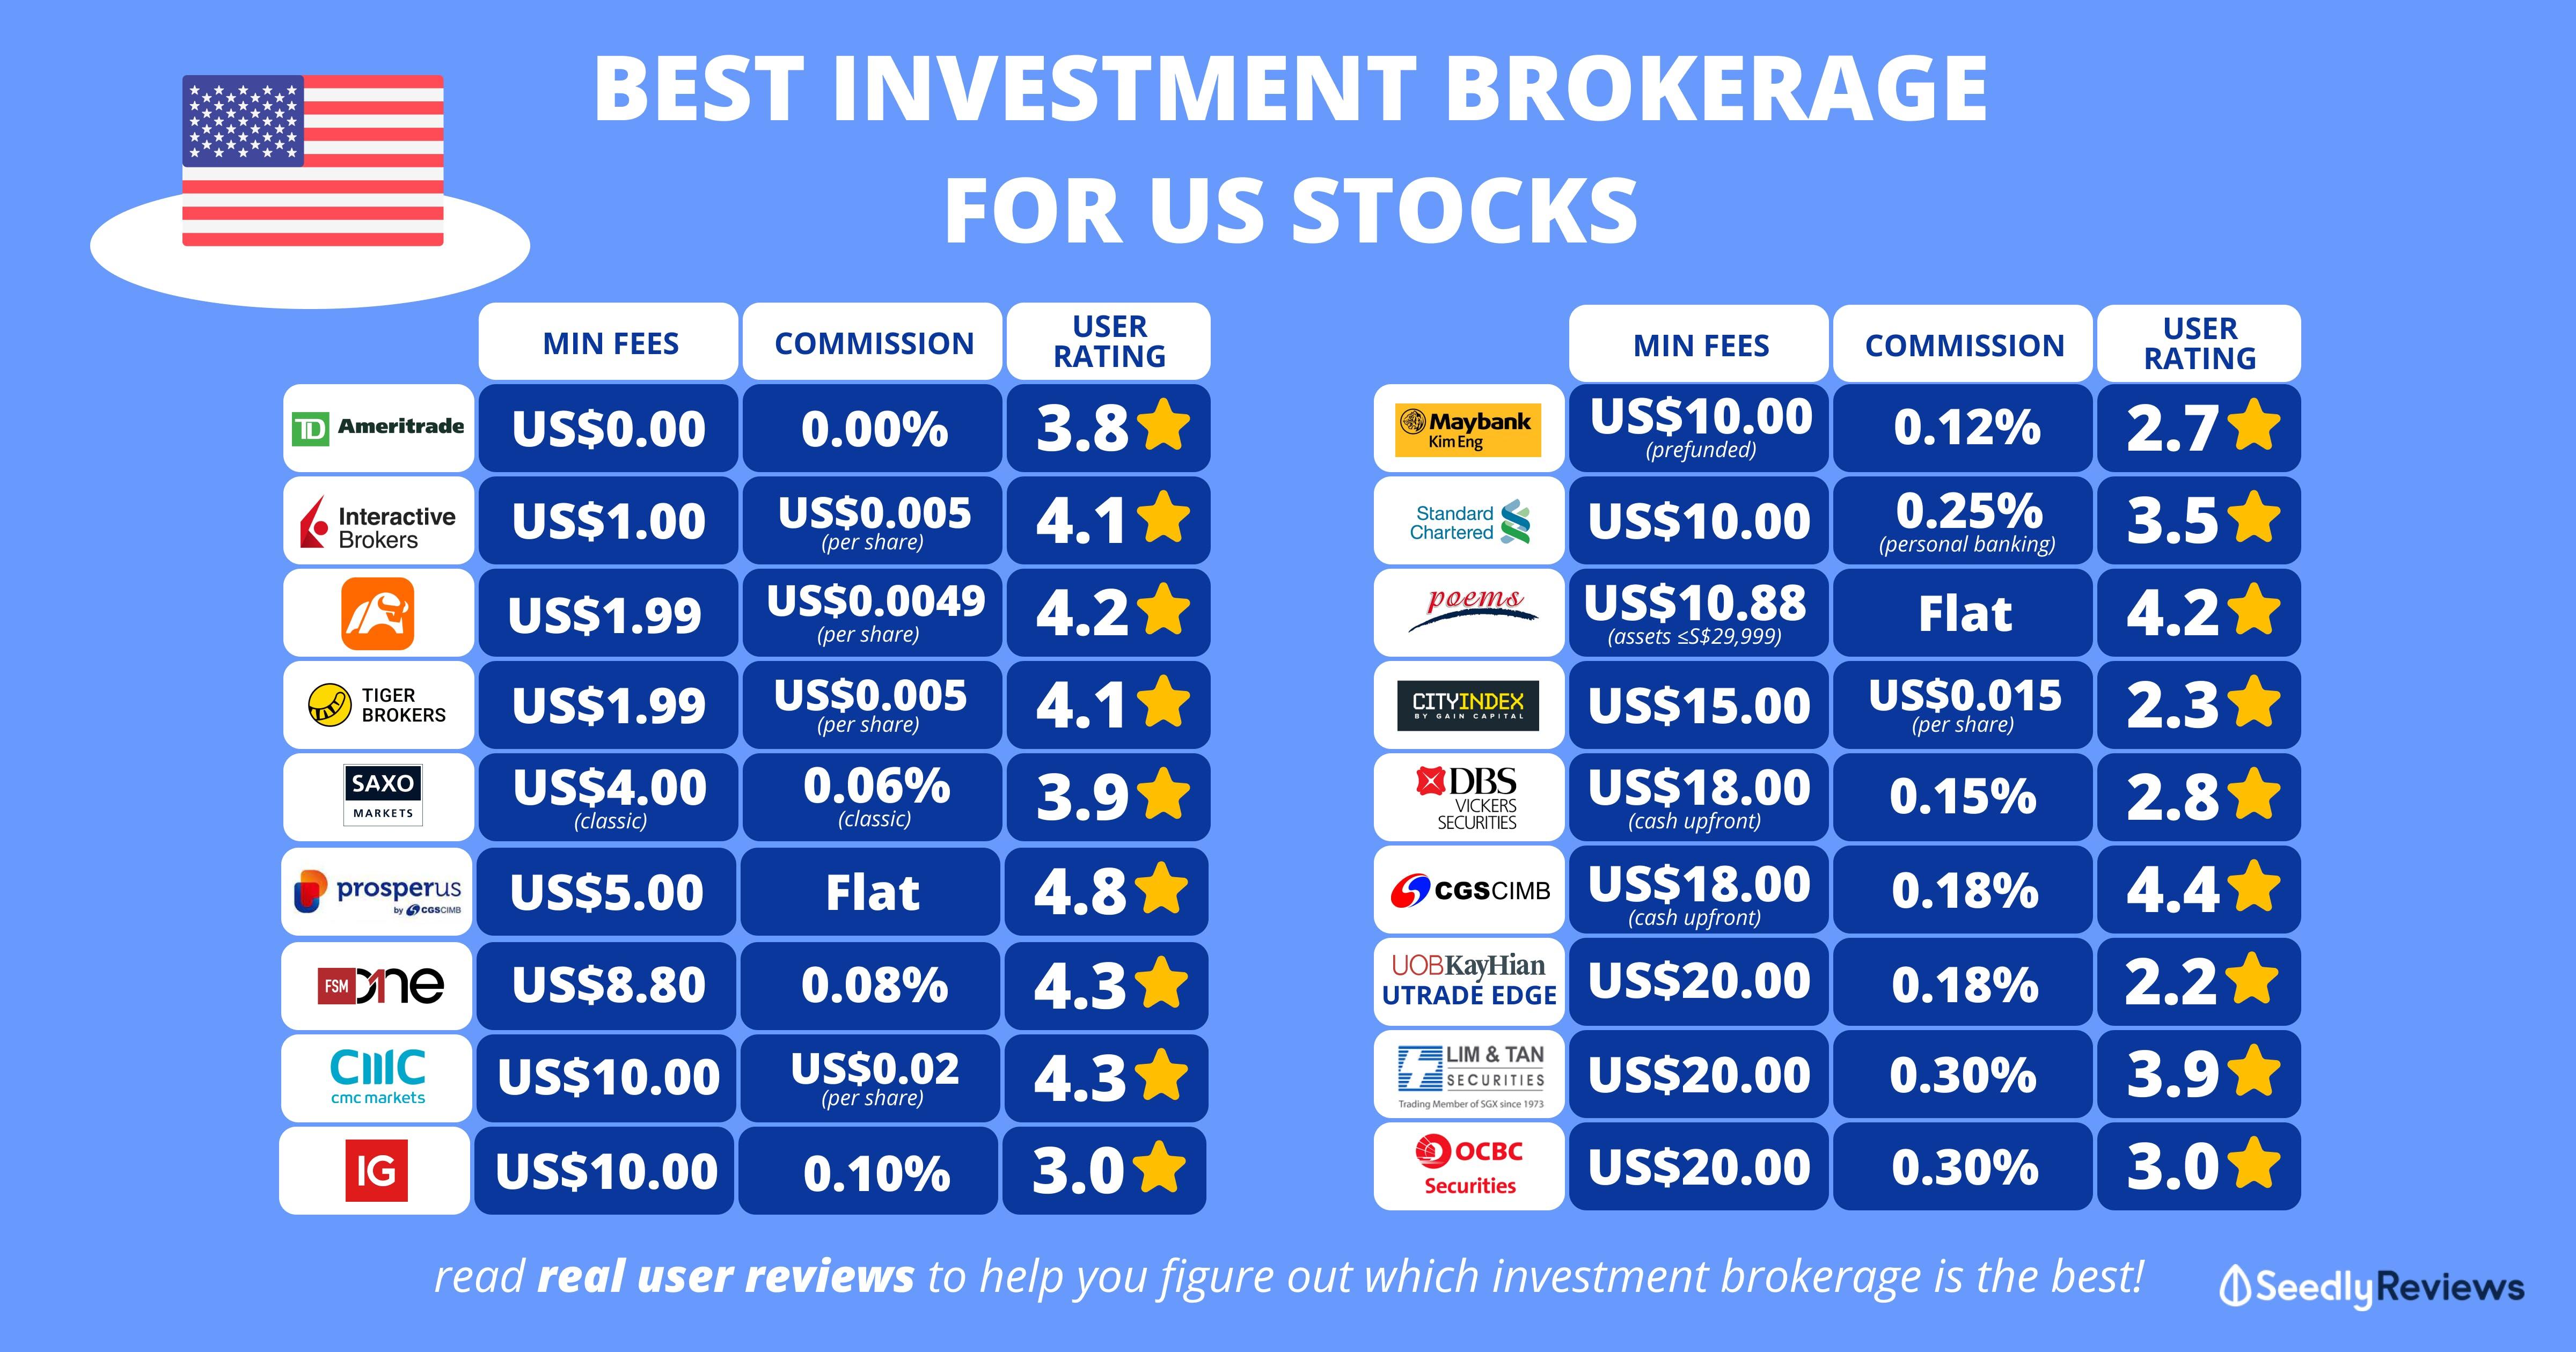 best investment brokerage for us stocks